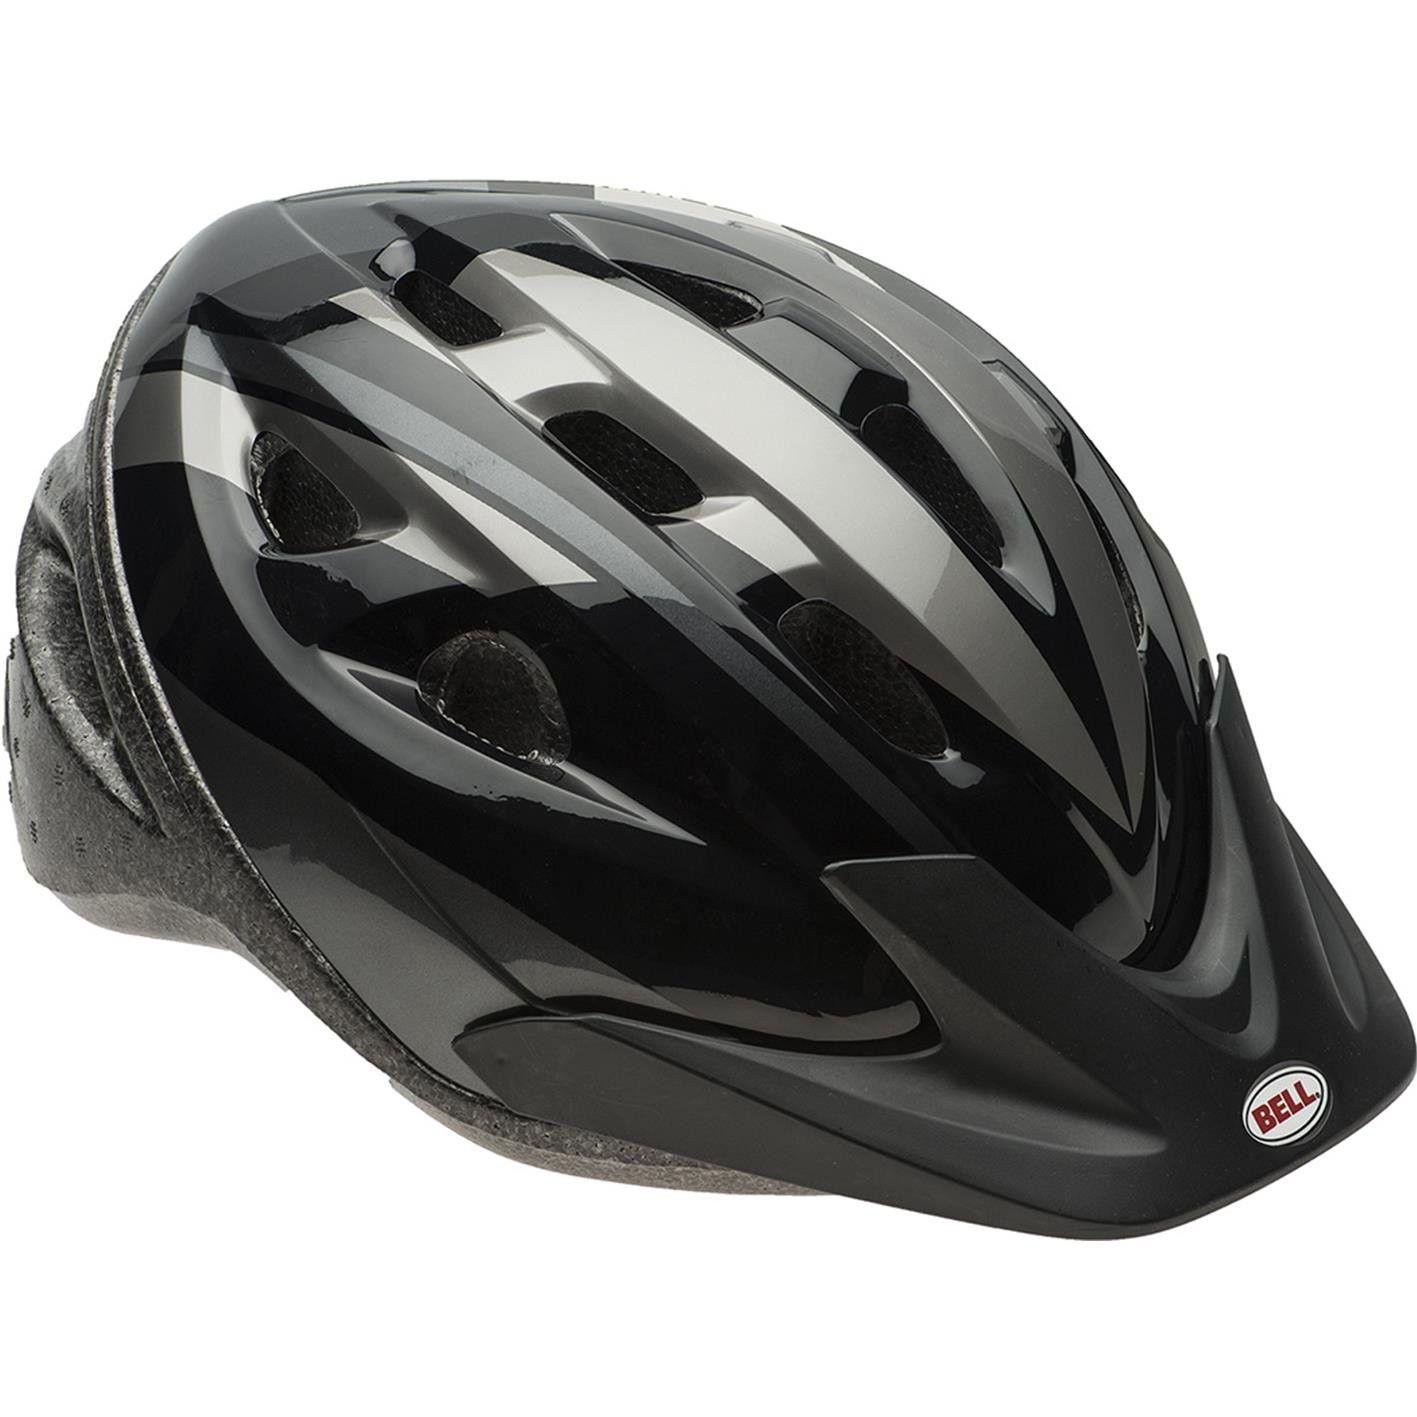 Capacete Ciclismo Bell Rig Preto/Titanio MTB Speed Bike